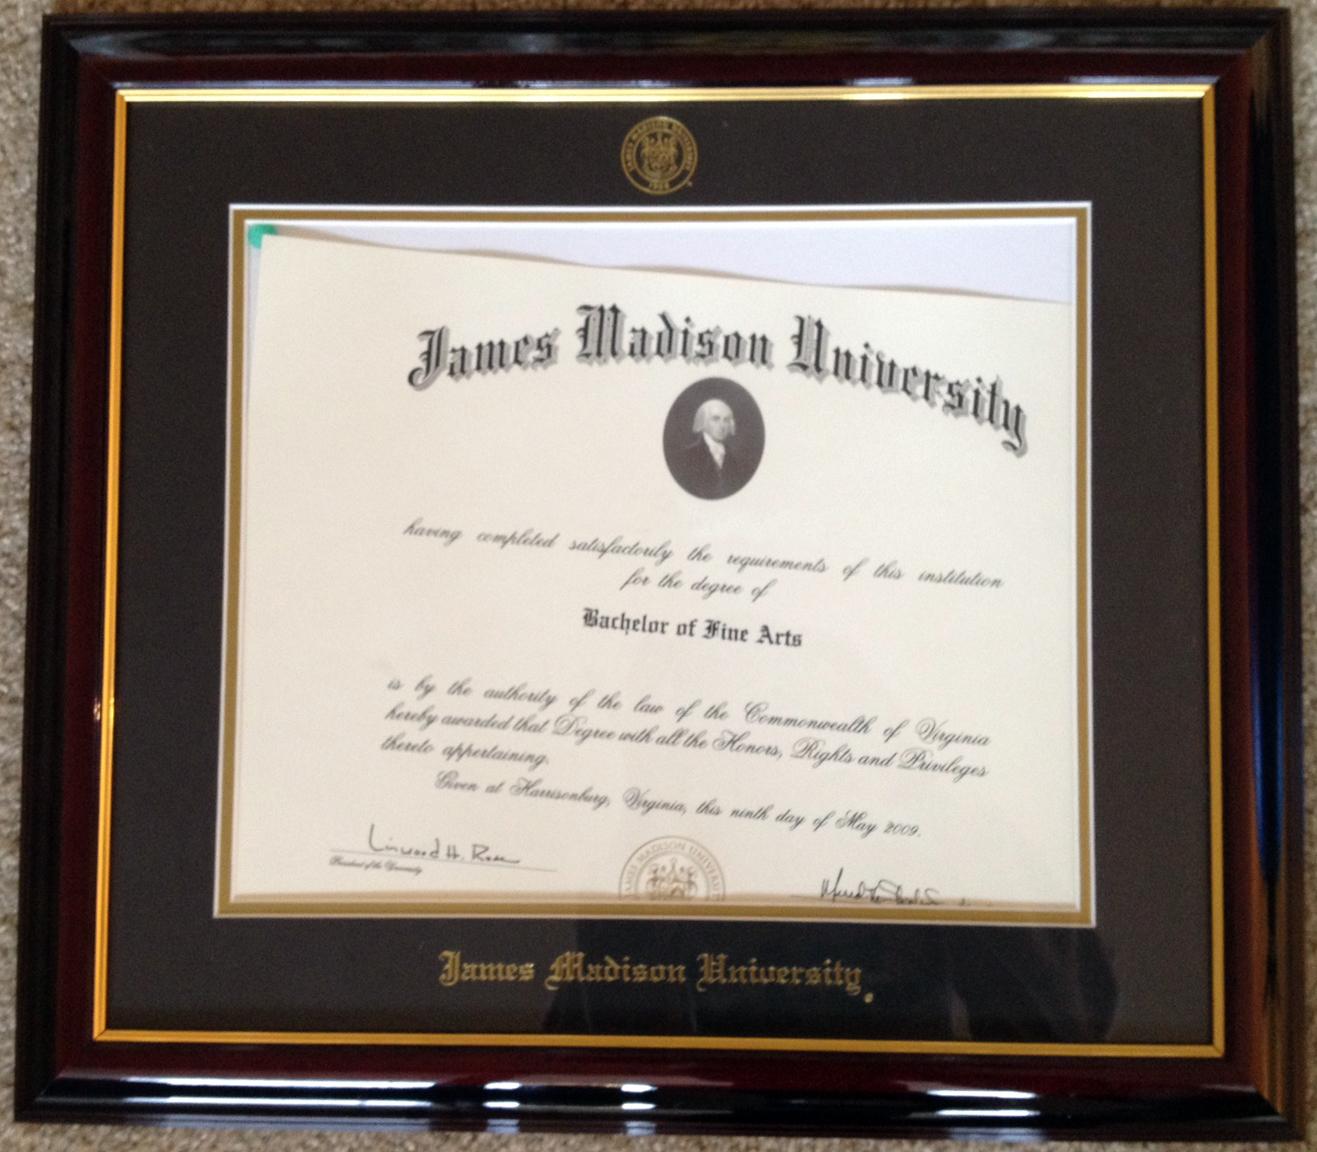 James Madison University Framing And Fine Art Blog